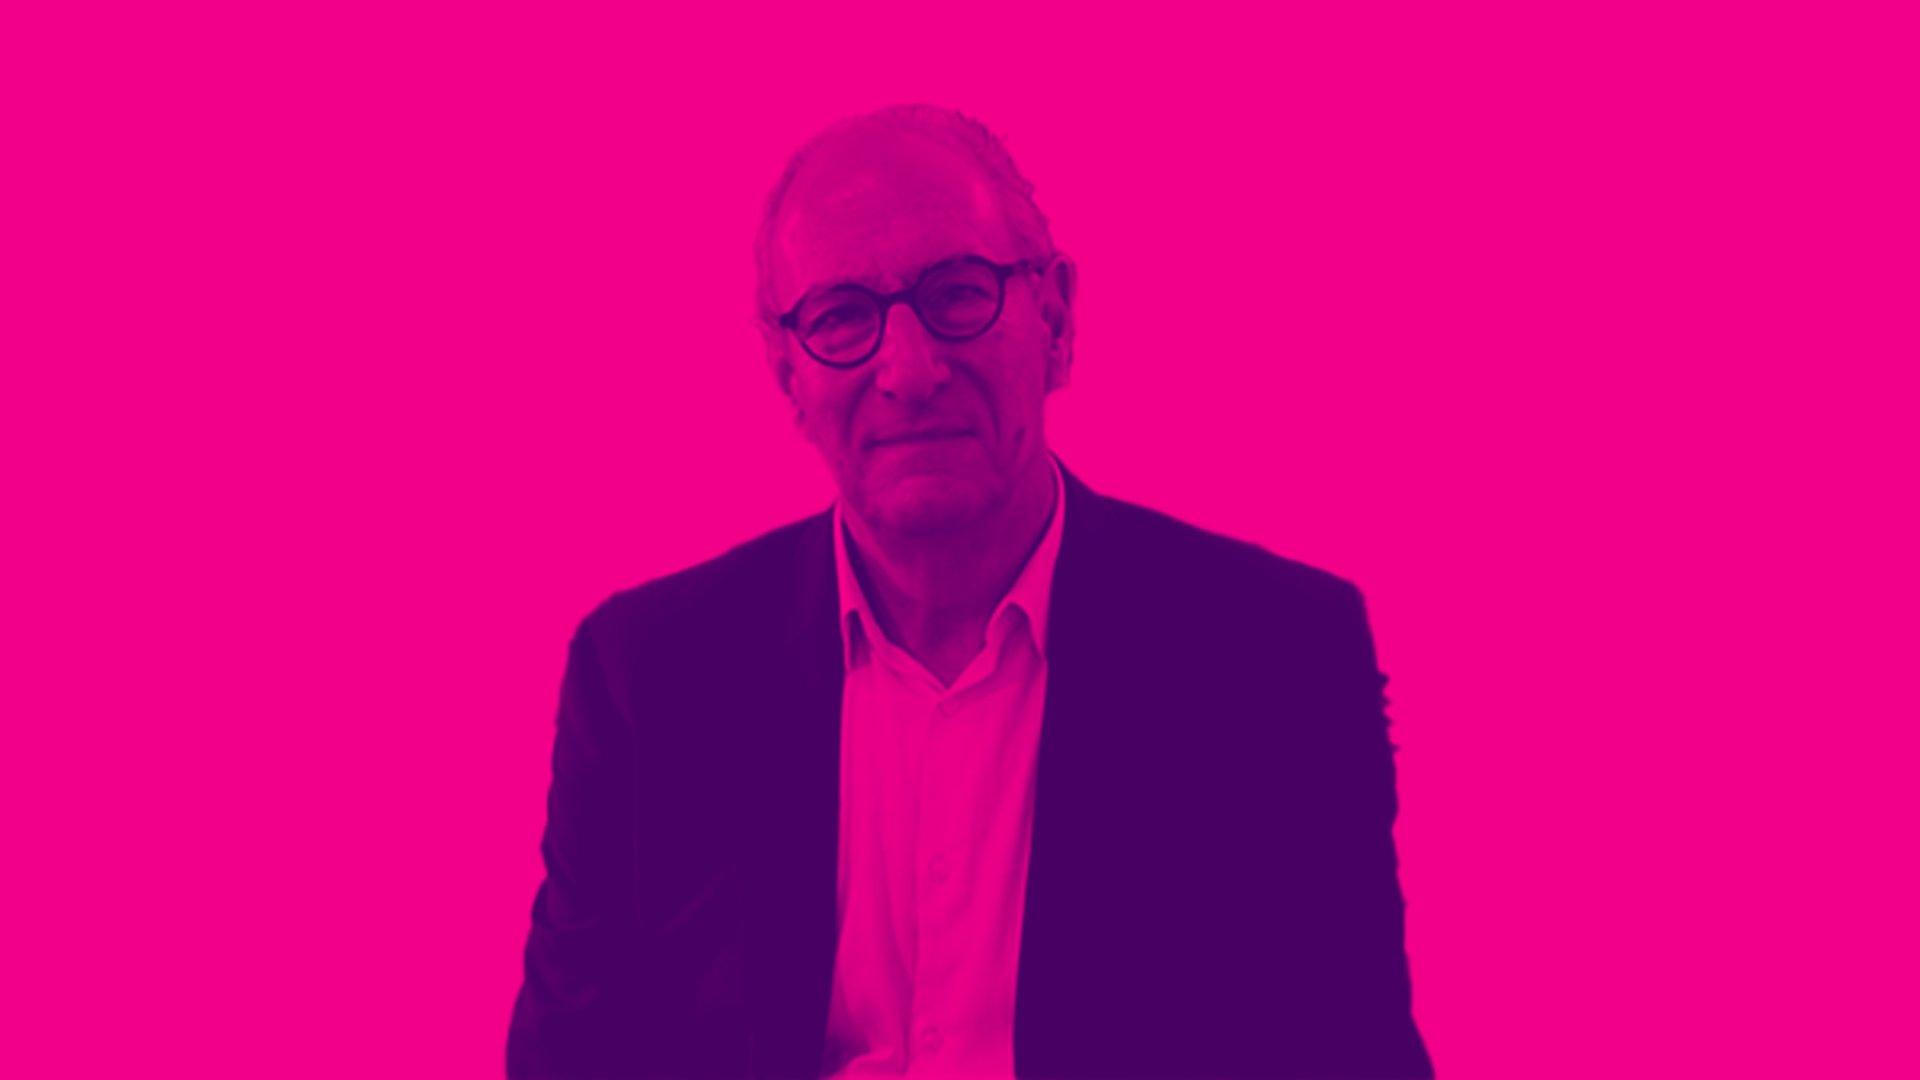 Nigel Paine